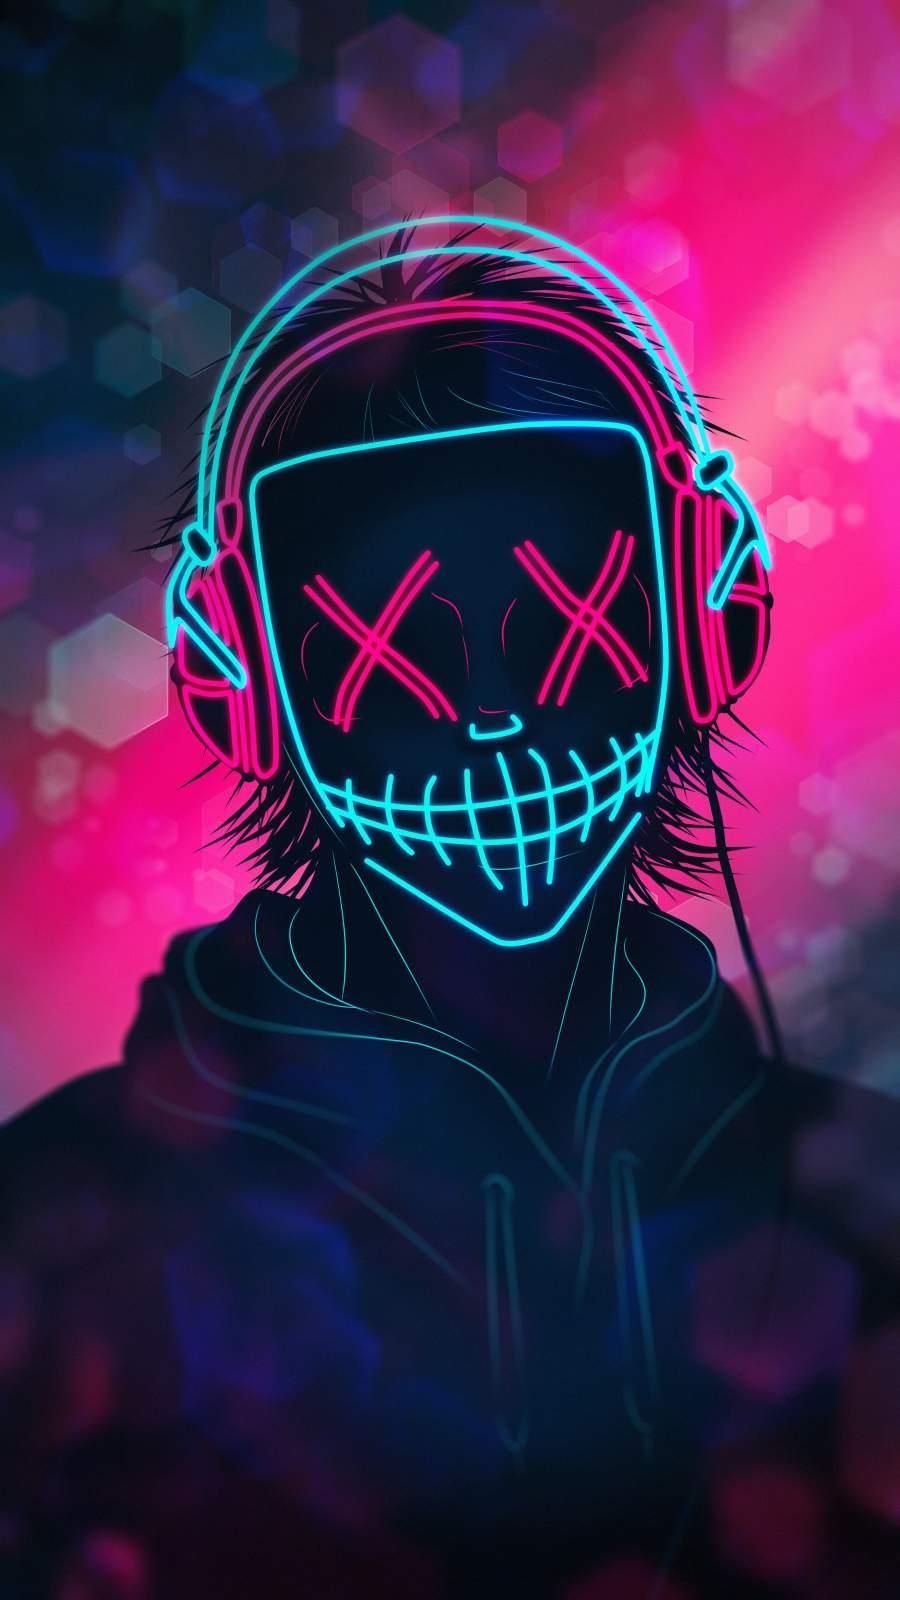 Neon Mask Music